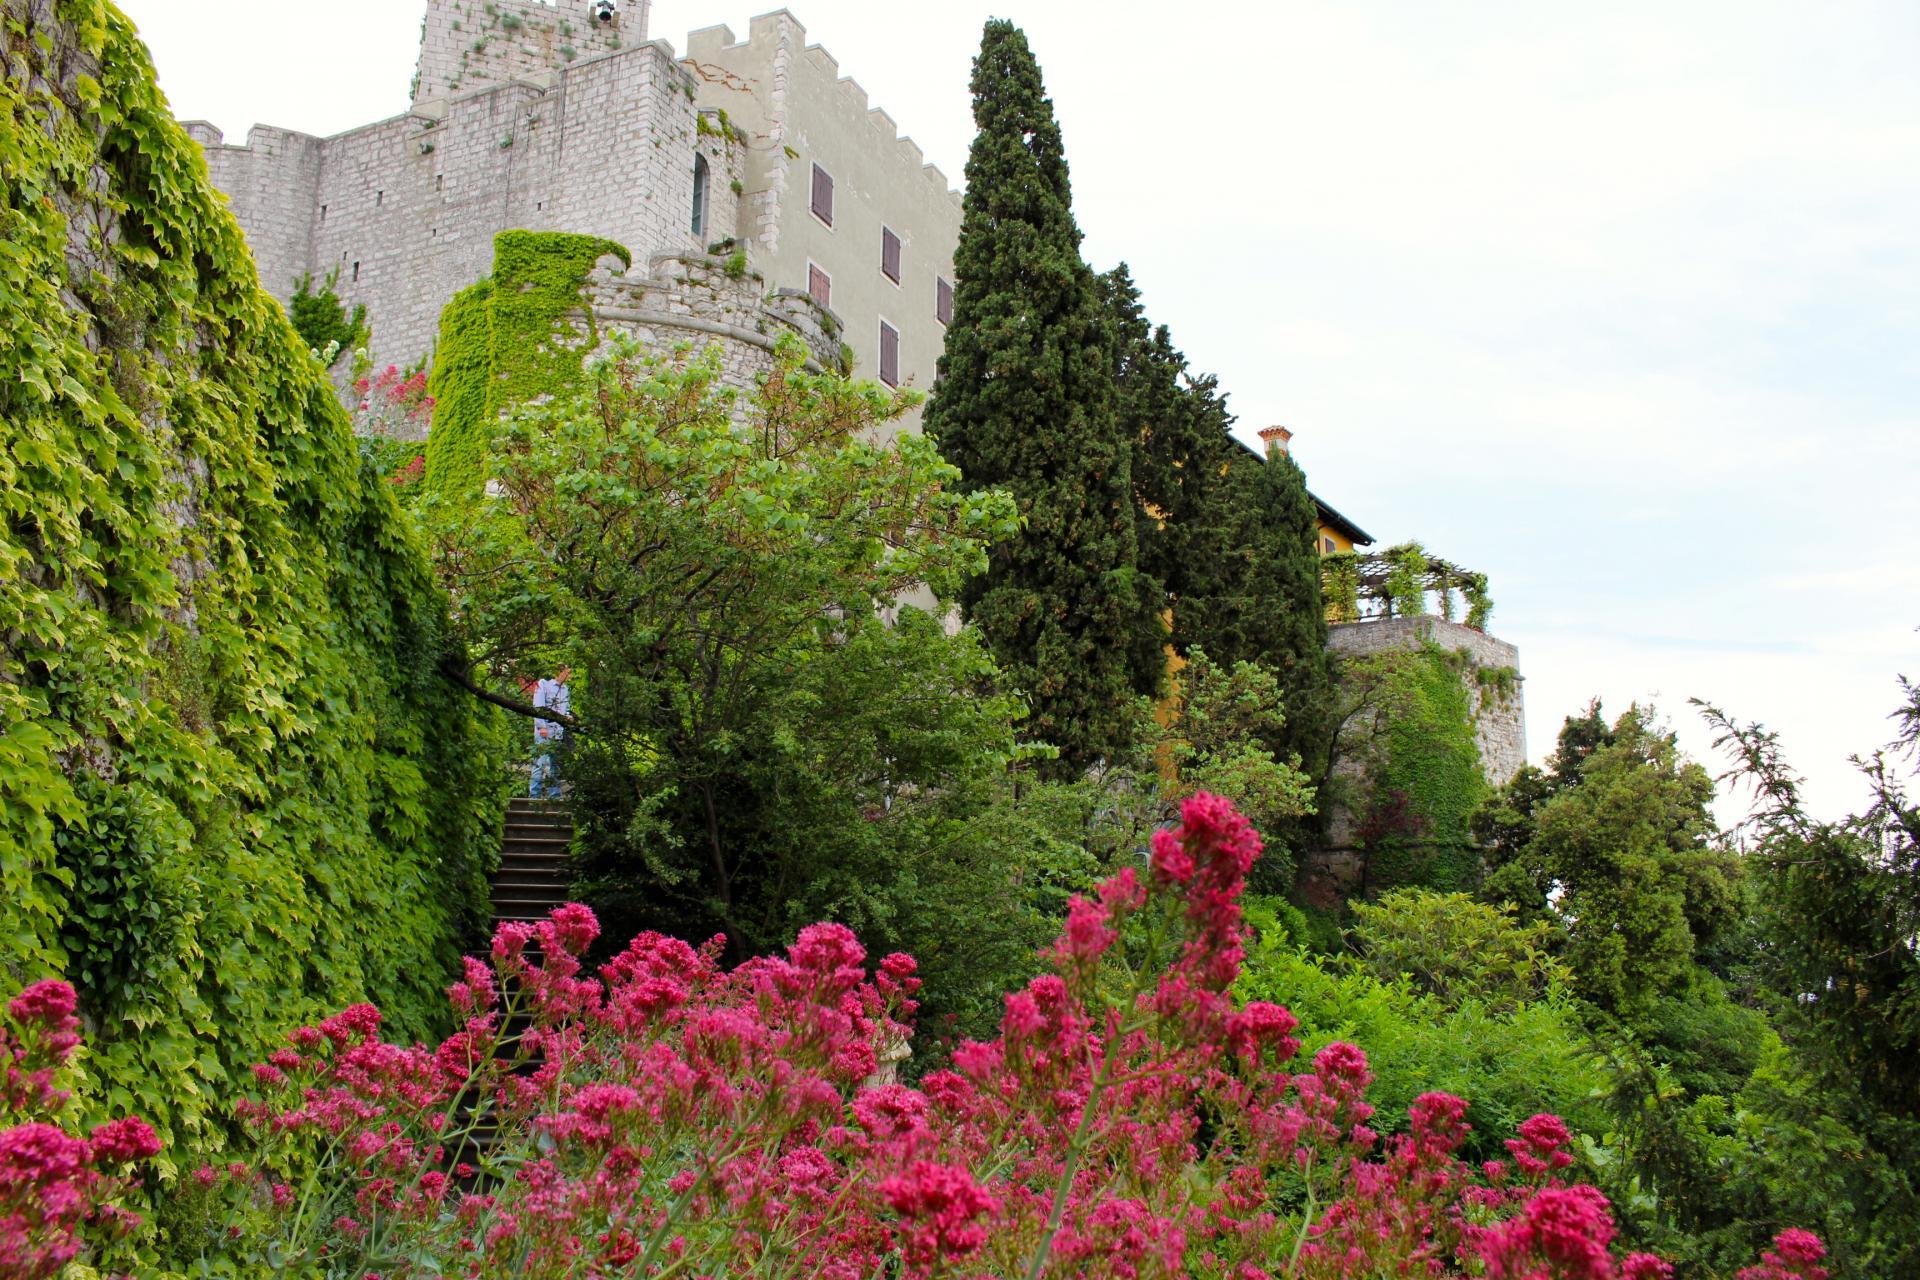 Le château de Duino